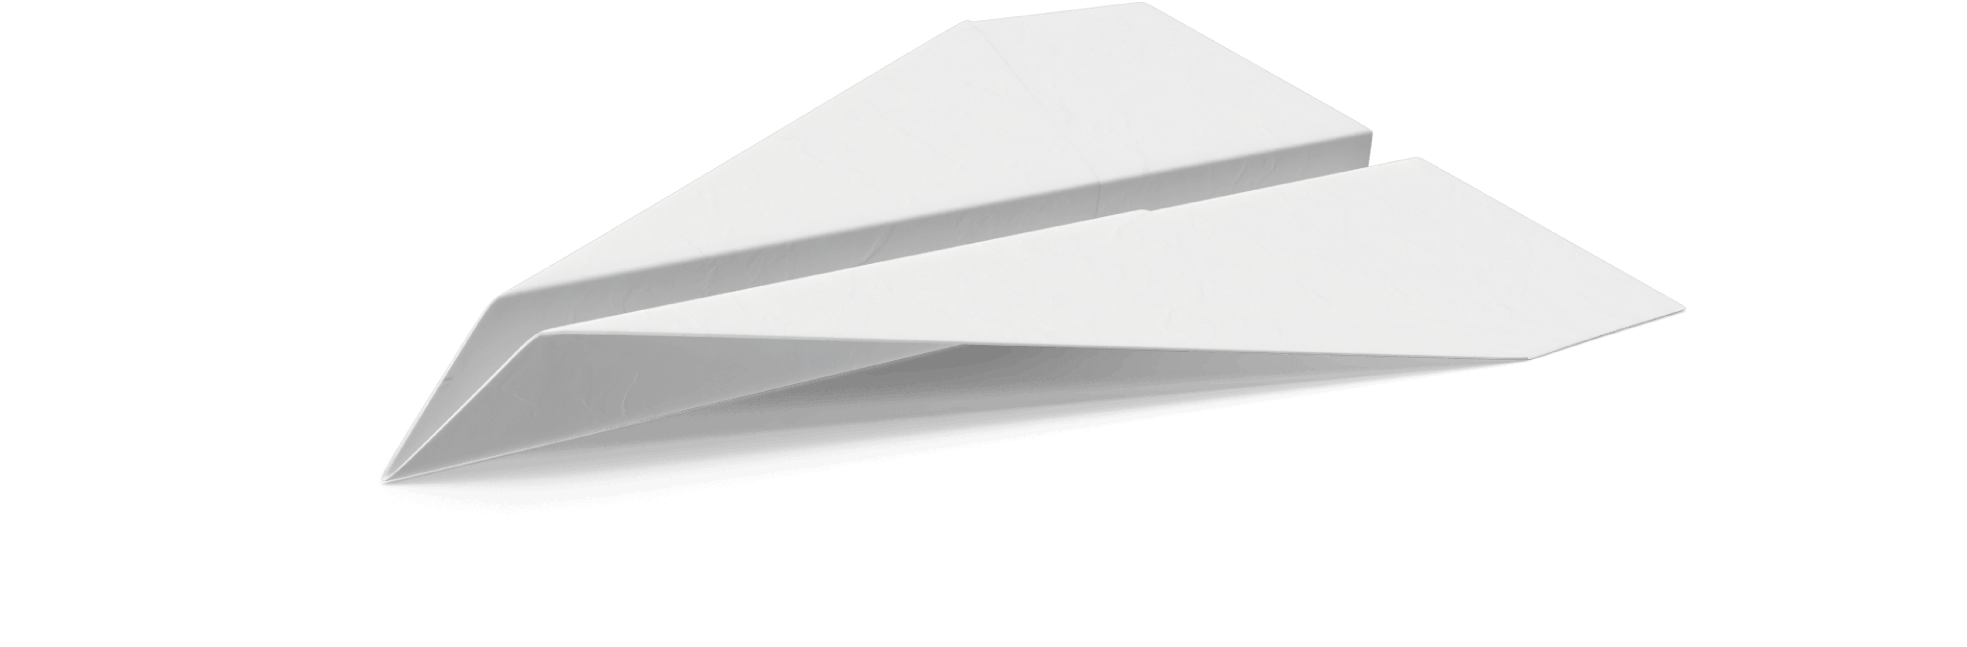 papieren vliegtuig e-learninig